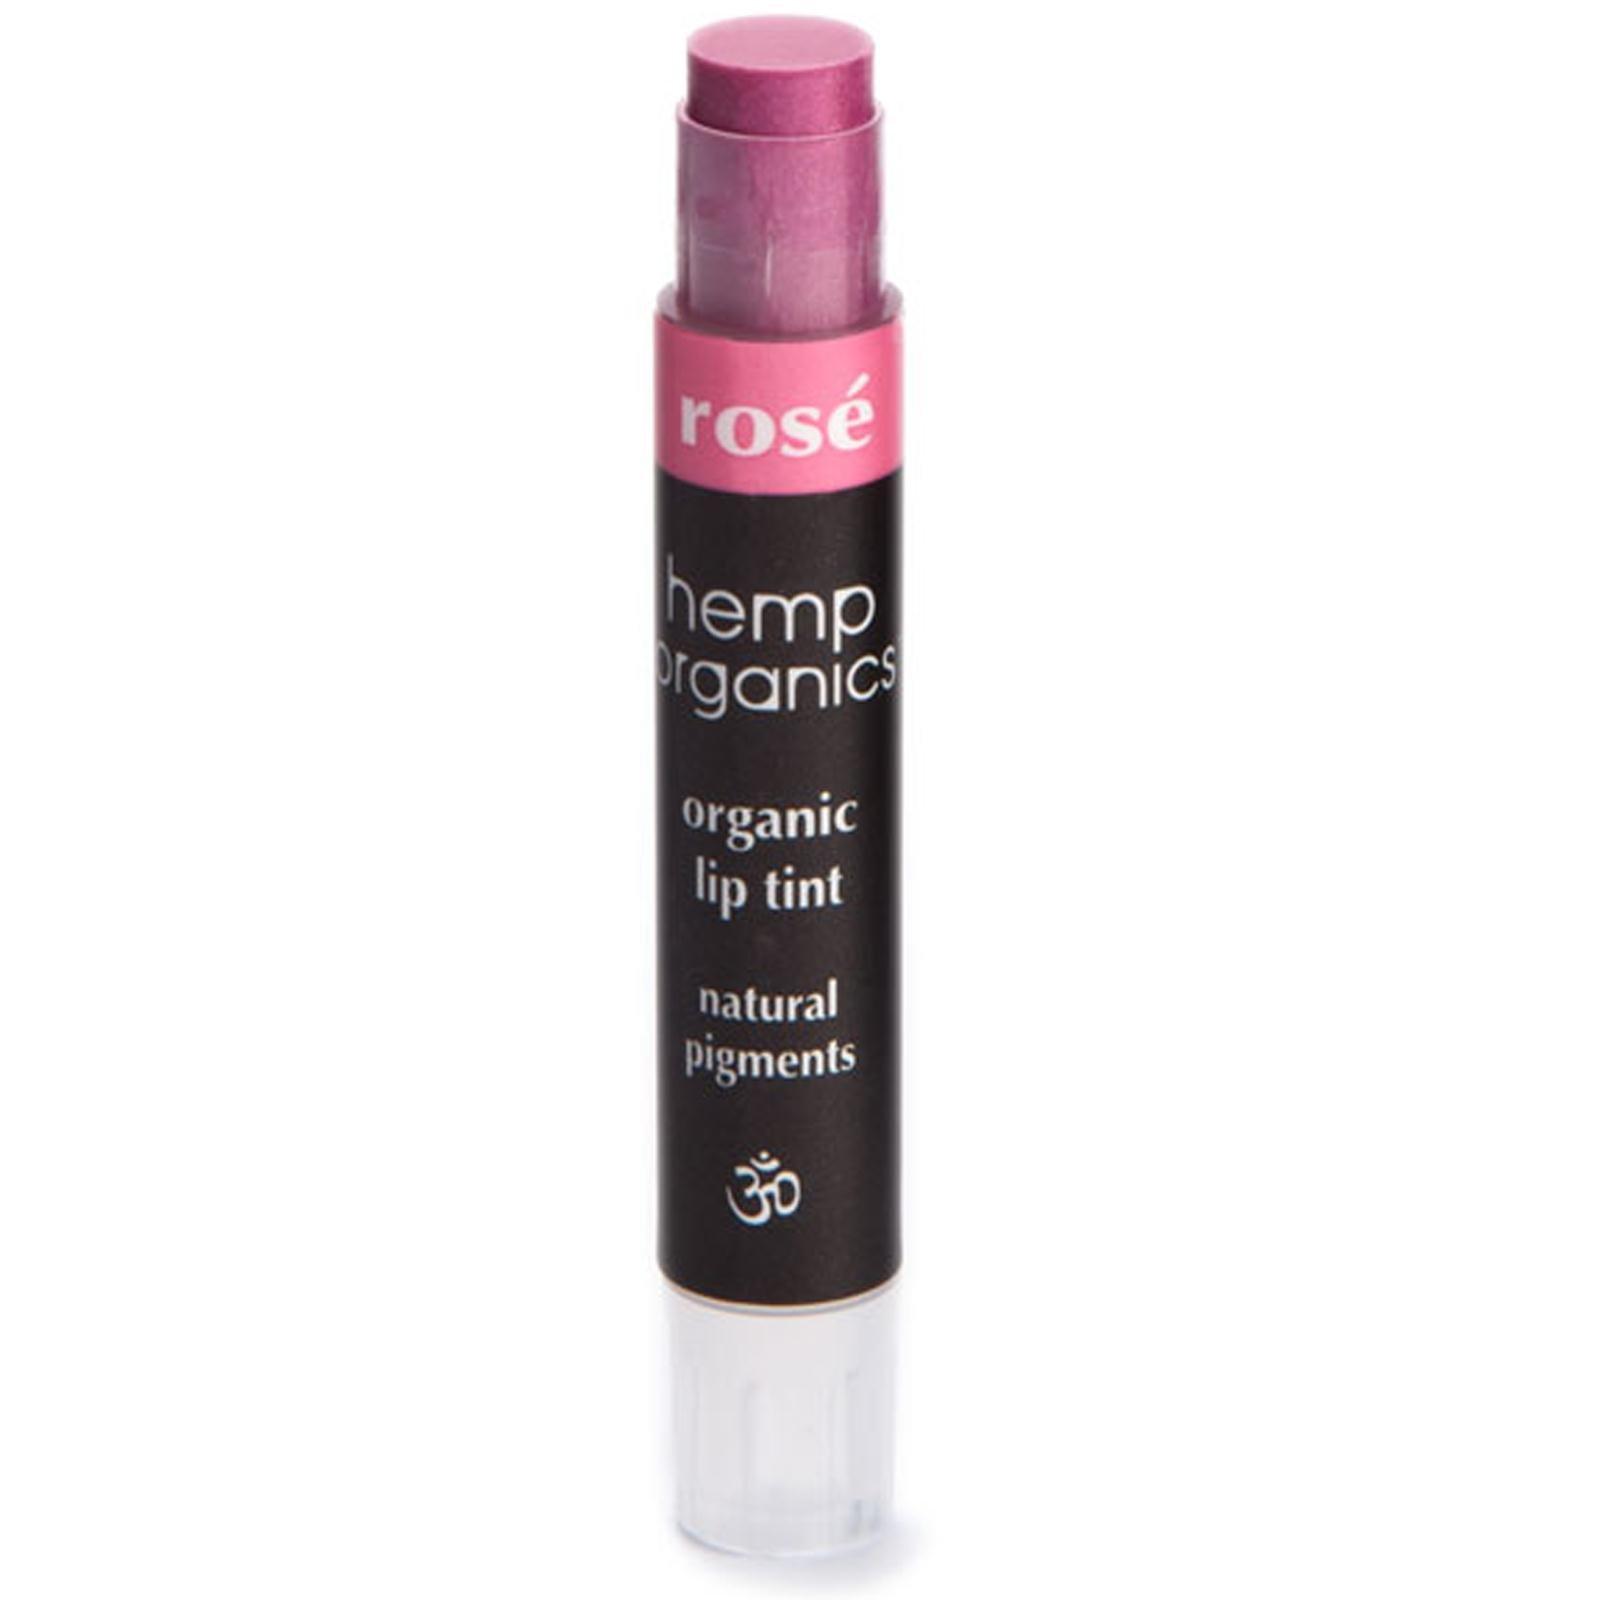 Rose Lip Tint Colorganics 2.5 gr Stick